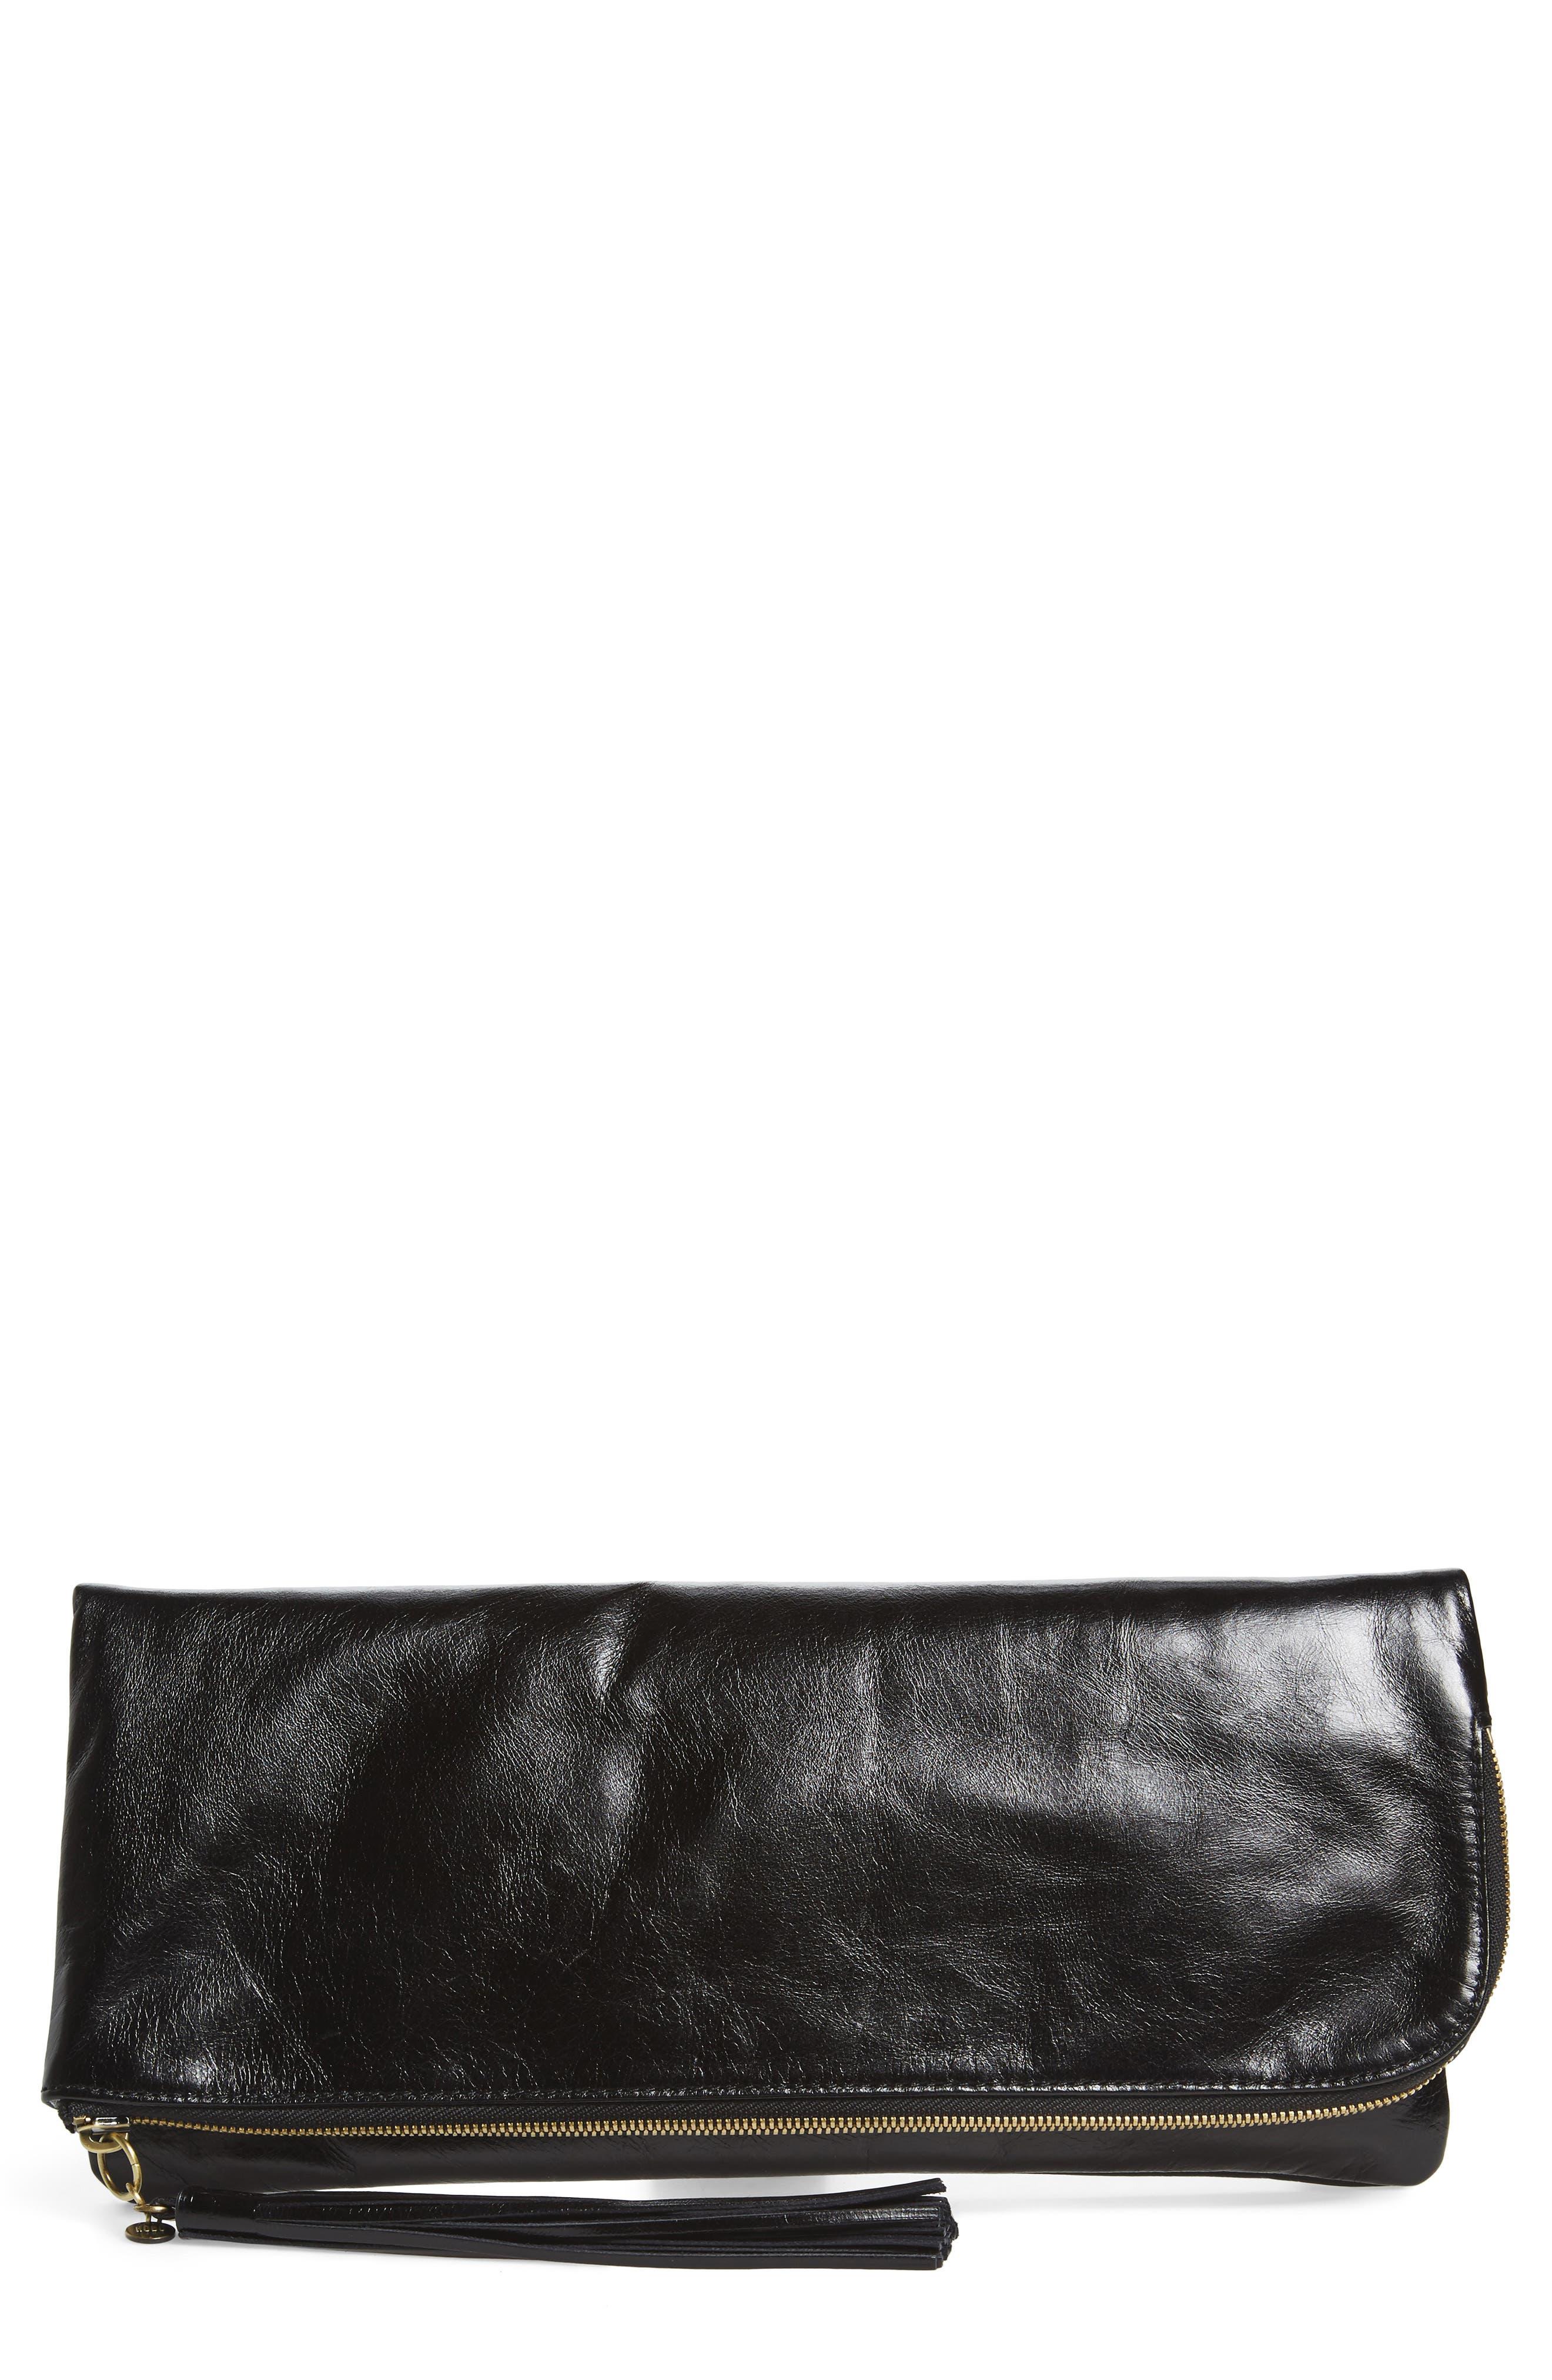 Hobo Raine Calfskin Leather Foldover Clutch